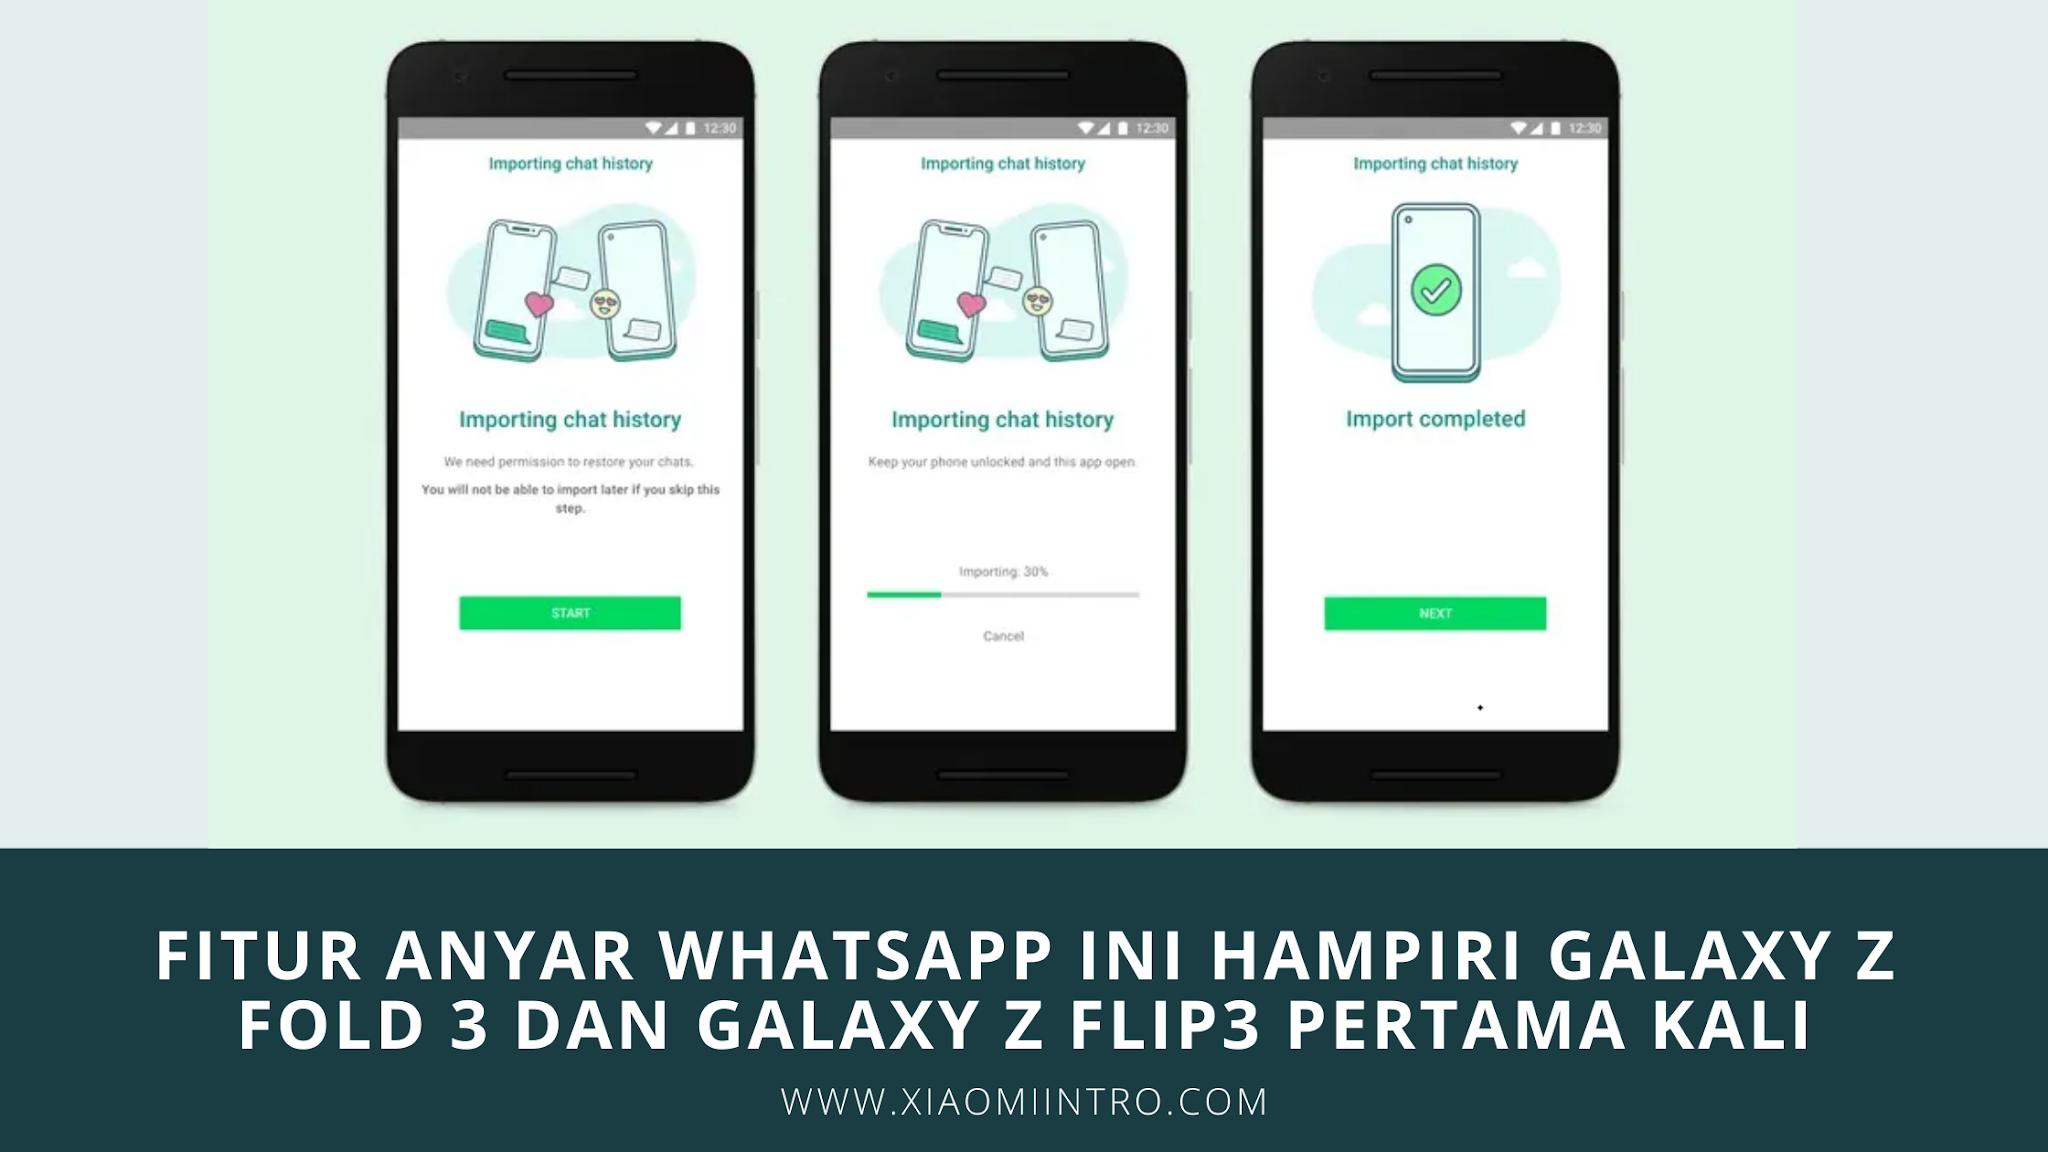 Fitur Anyar Whatsapp Ini Hampiri Galaxy Z Fold 3 Dan Galaxy Z Flip3 Pertama Kali